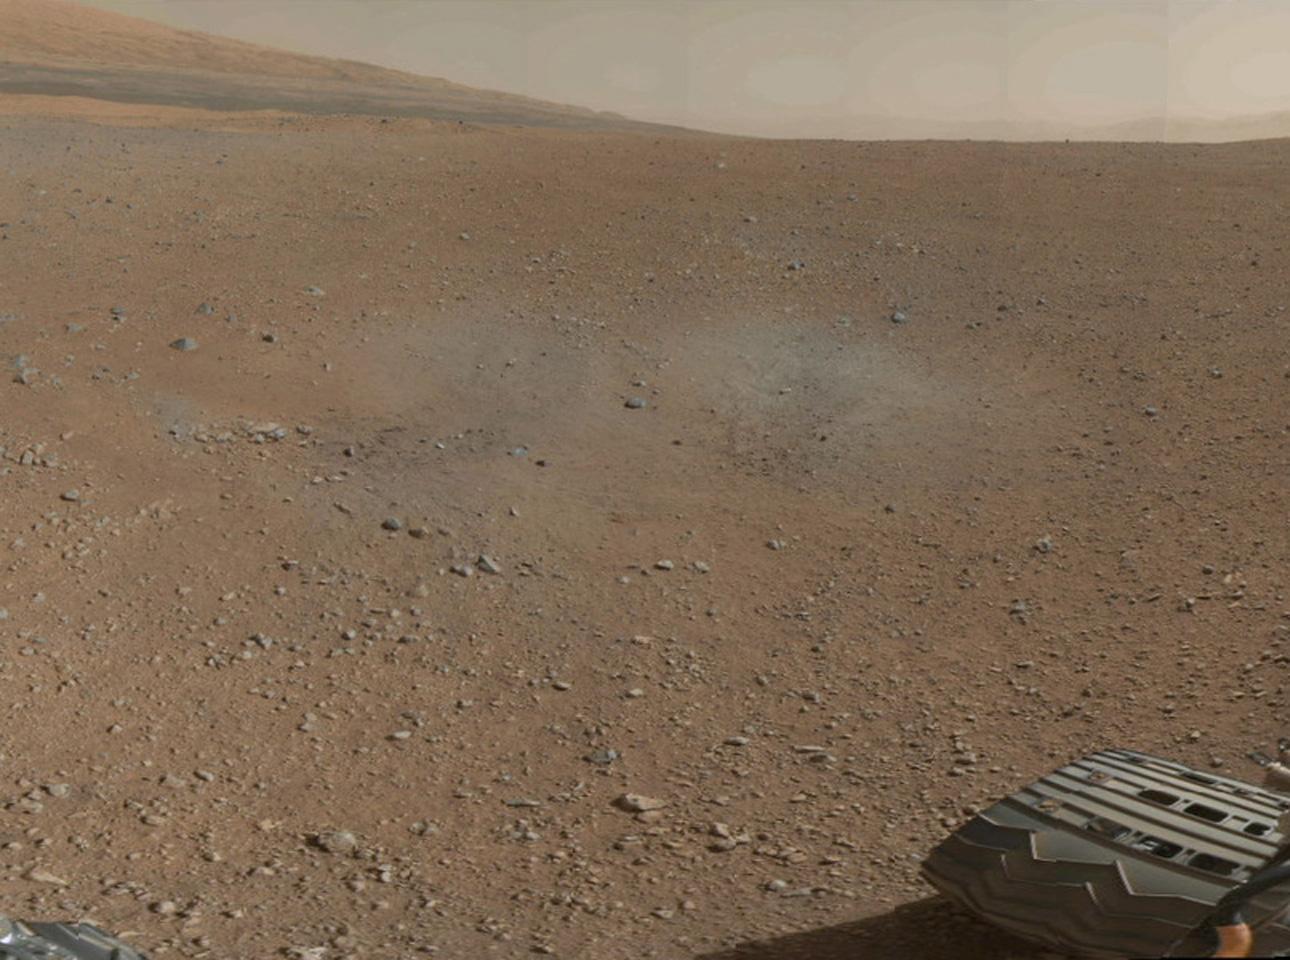 Curiosity rover sends back first 360-degree color photos ...